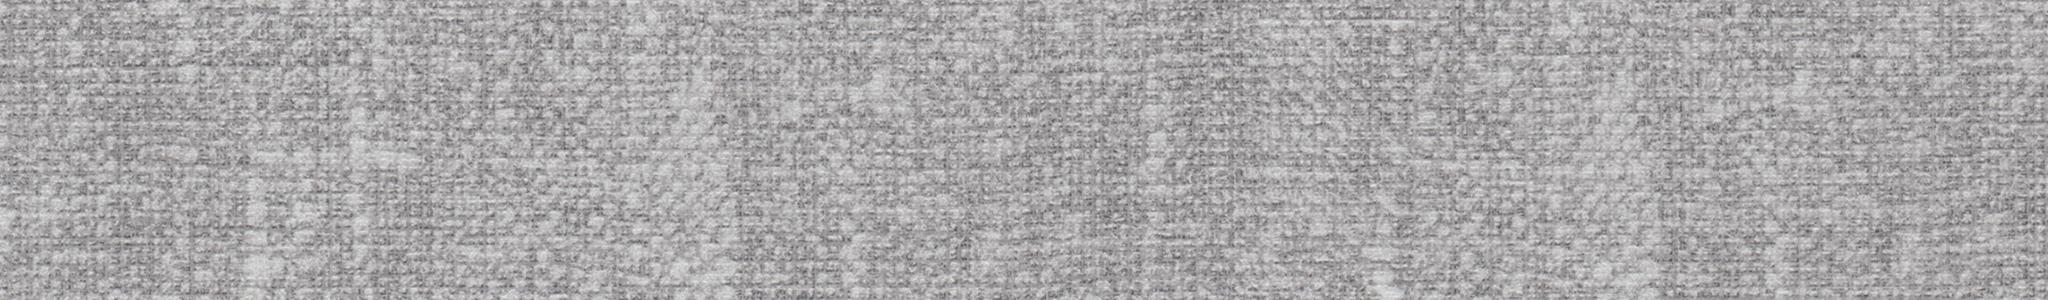 HD 295805 ABS Edge Fabric Atlas